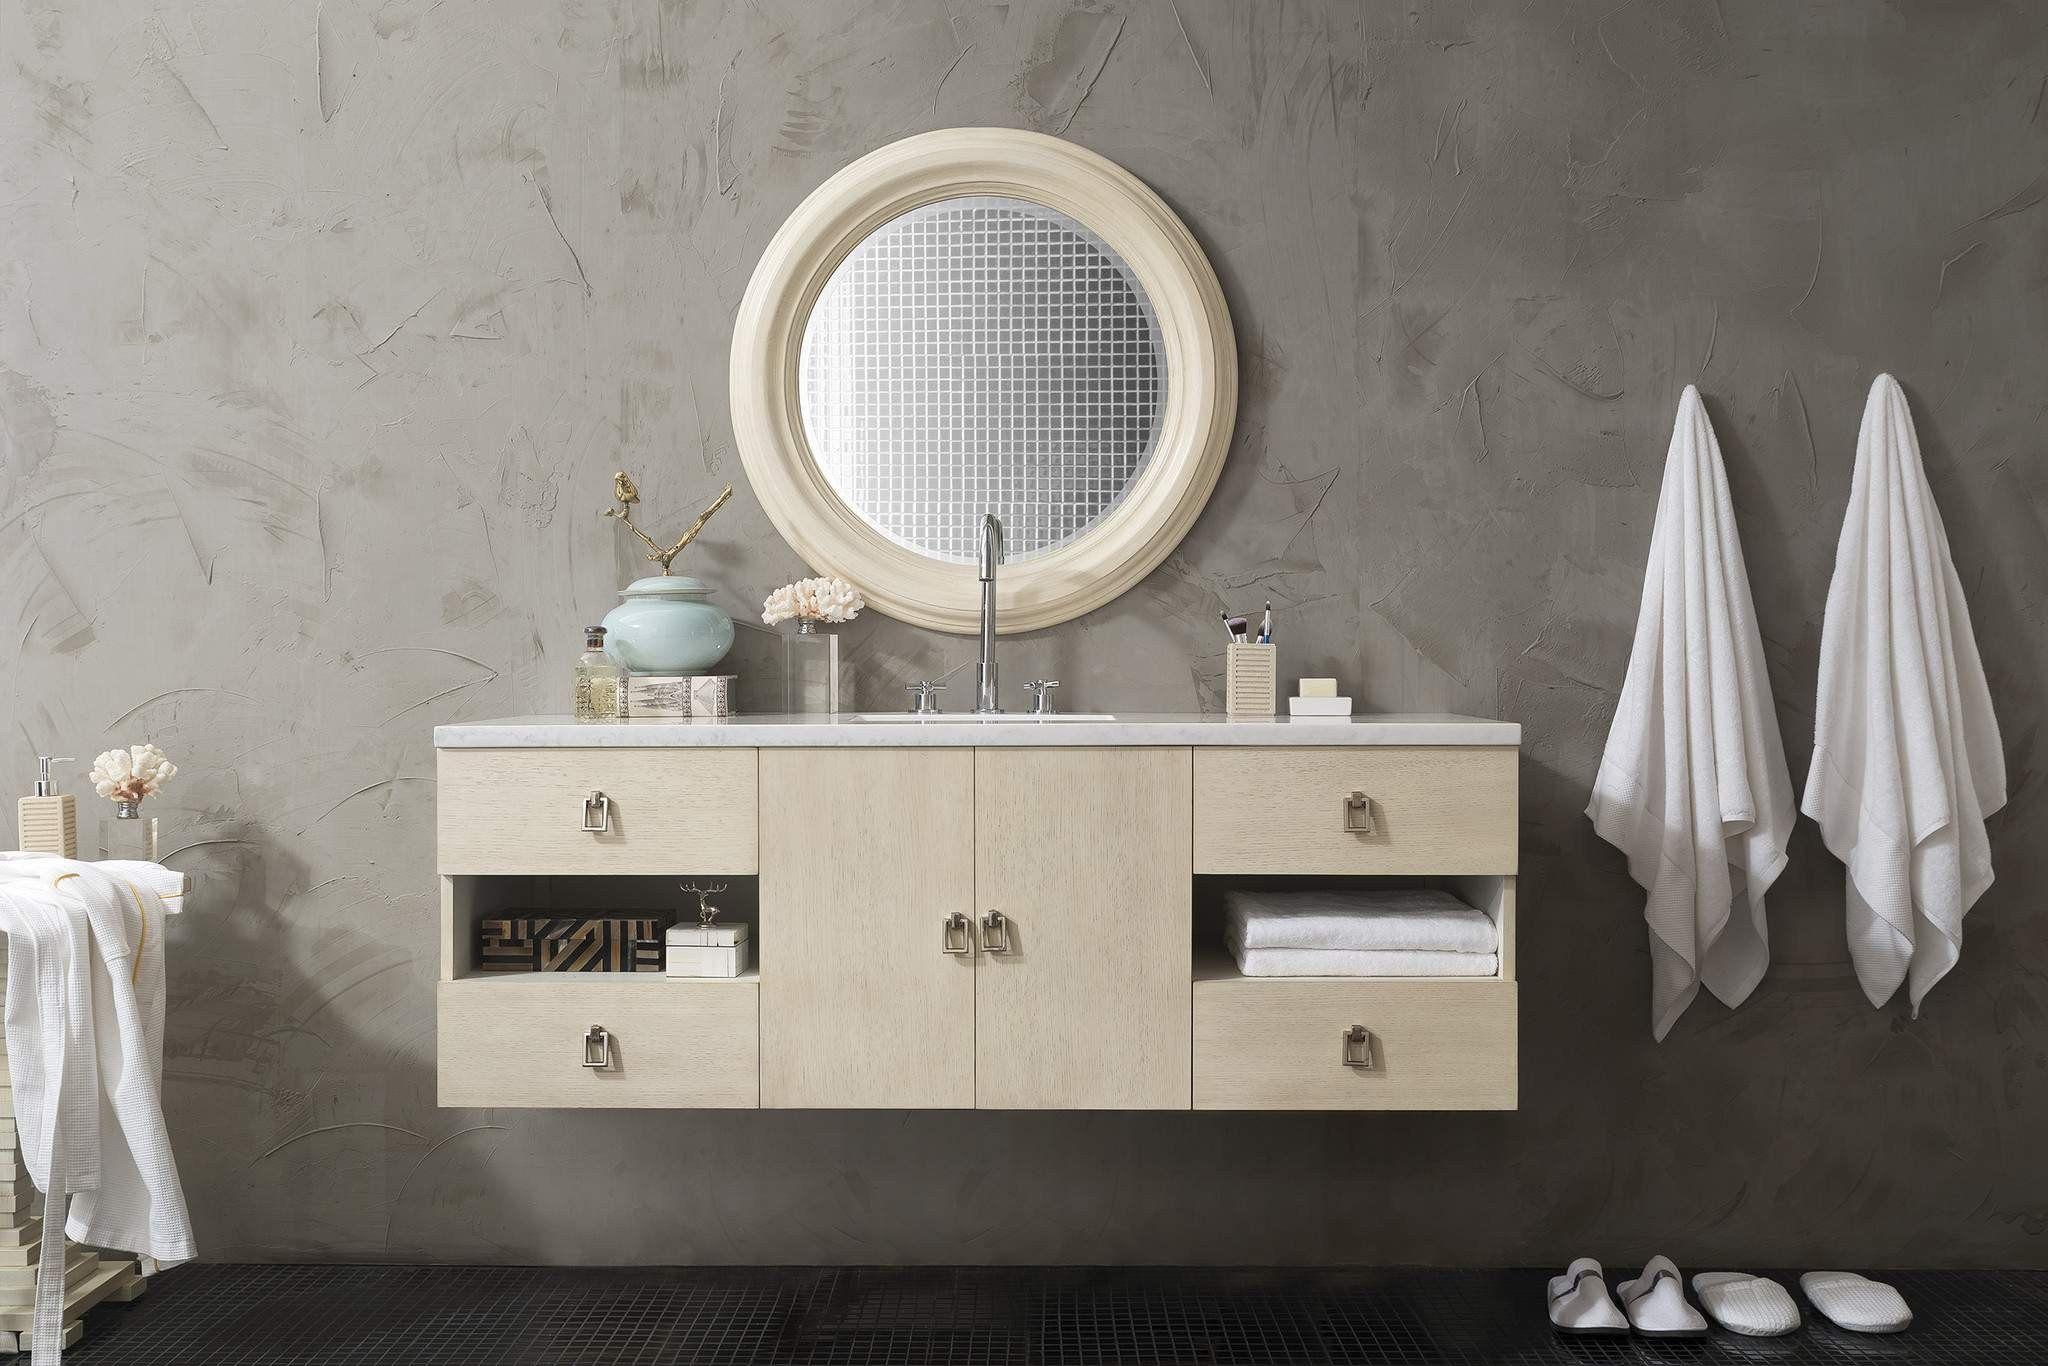 James Martin 860 V60s Vno Sonoma 60 Inch Single Vanity Vanilla Oak In 2021 Bathroom Vanities Without Tops Contemporary Bathroom Vanity Single Bathroom Vanity